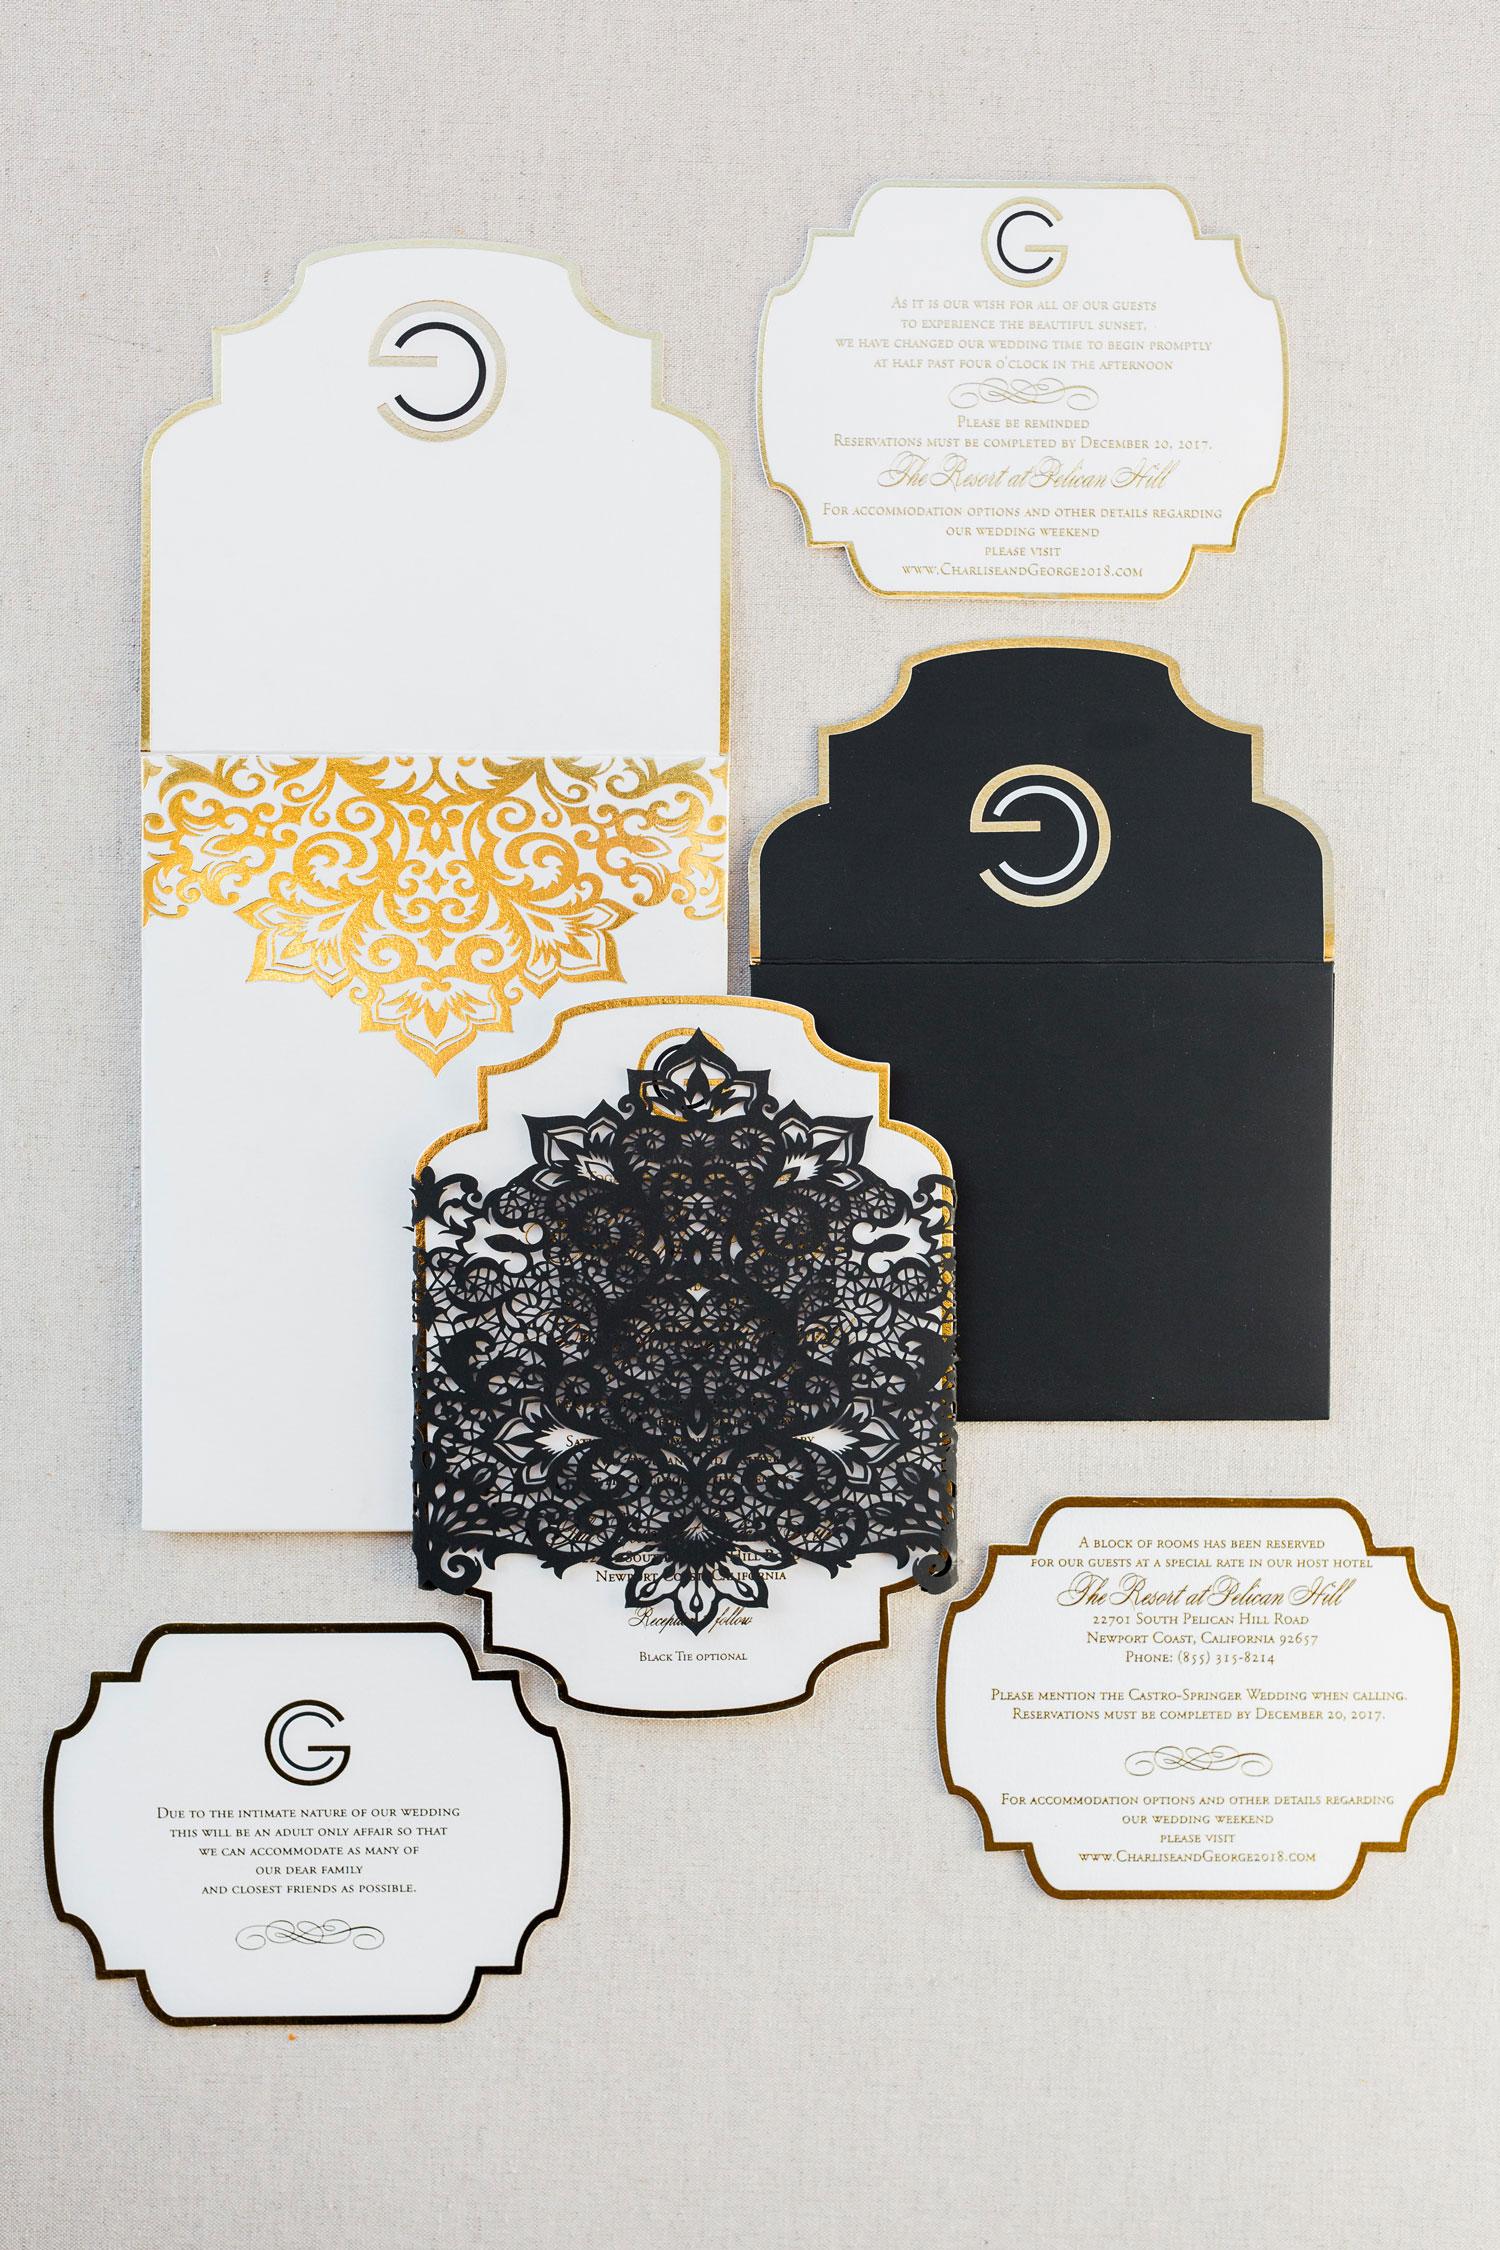 laser cut wedding ideas laser-cut wedding invitation design black gold george springer iii charlise castro wedding